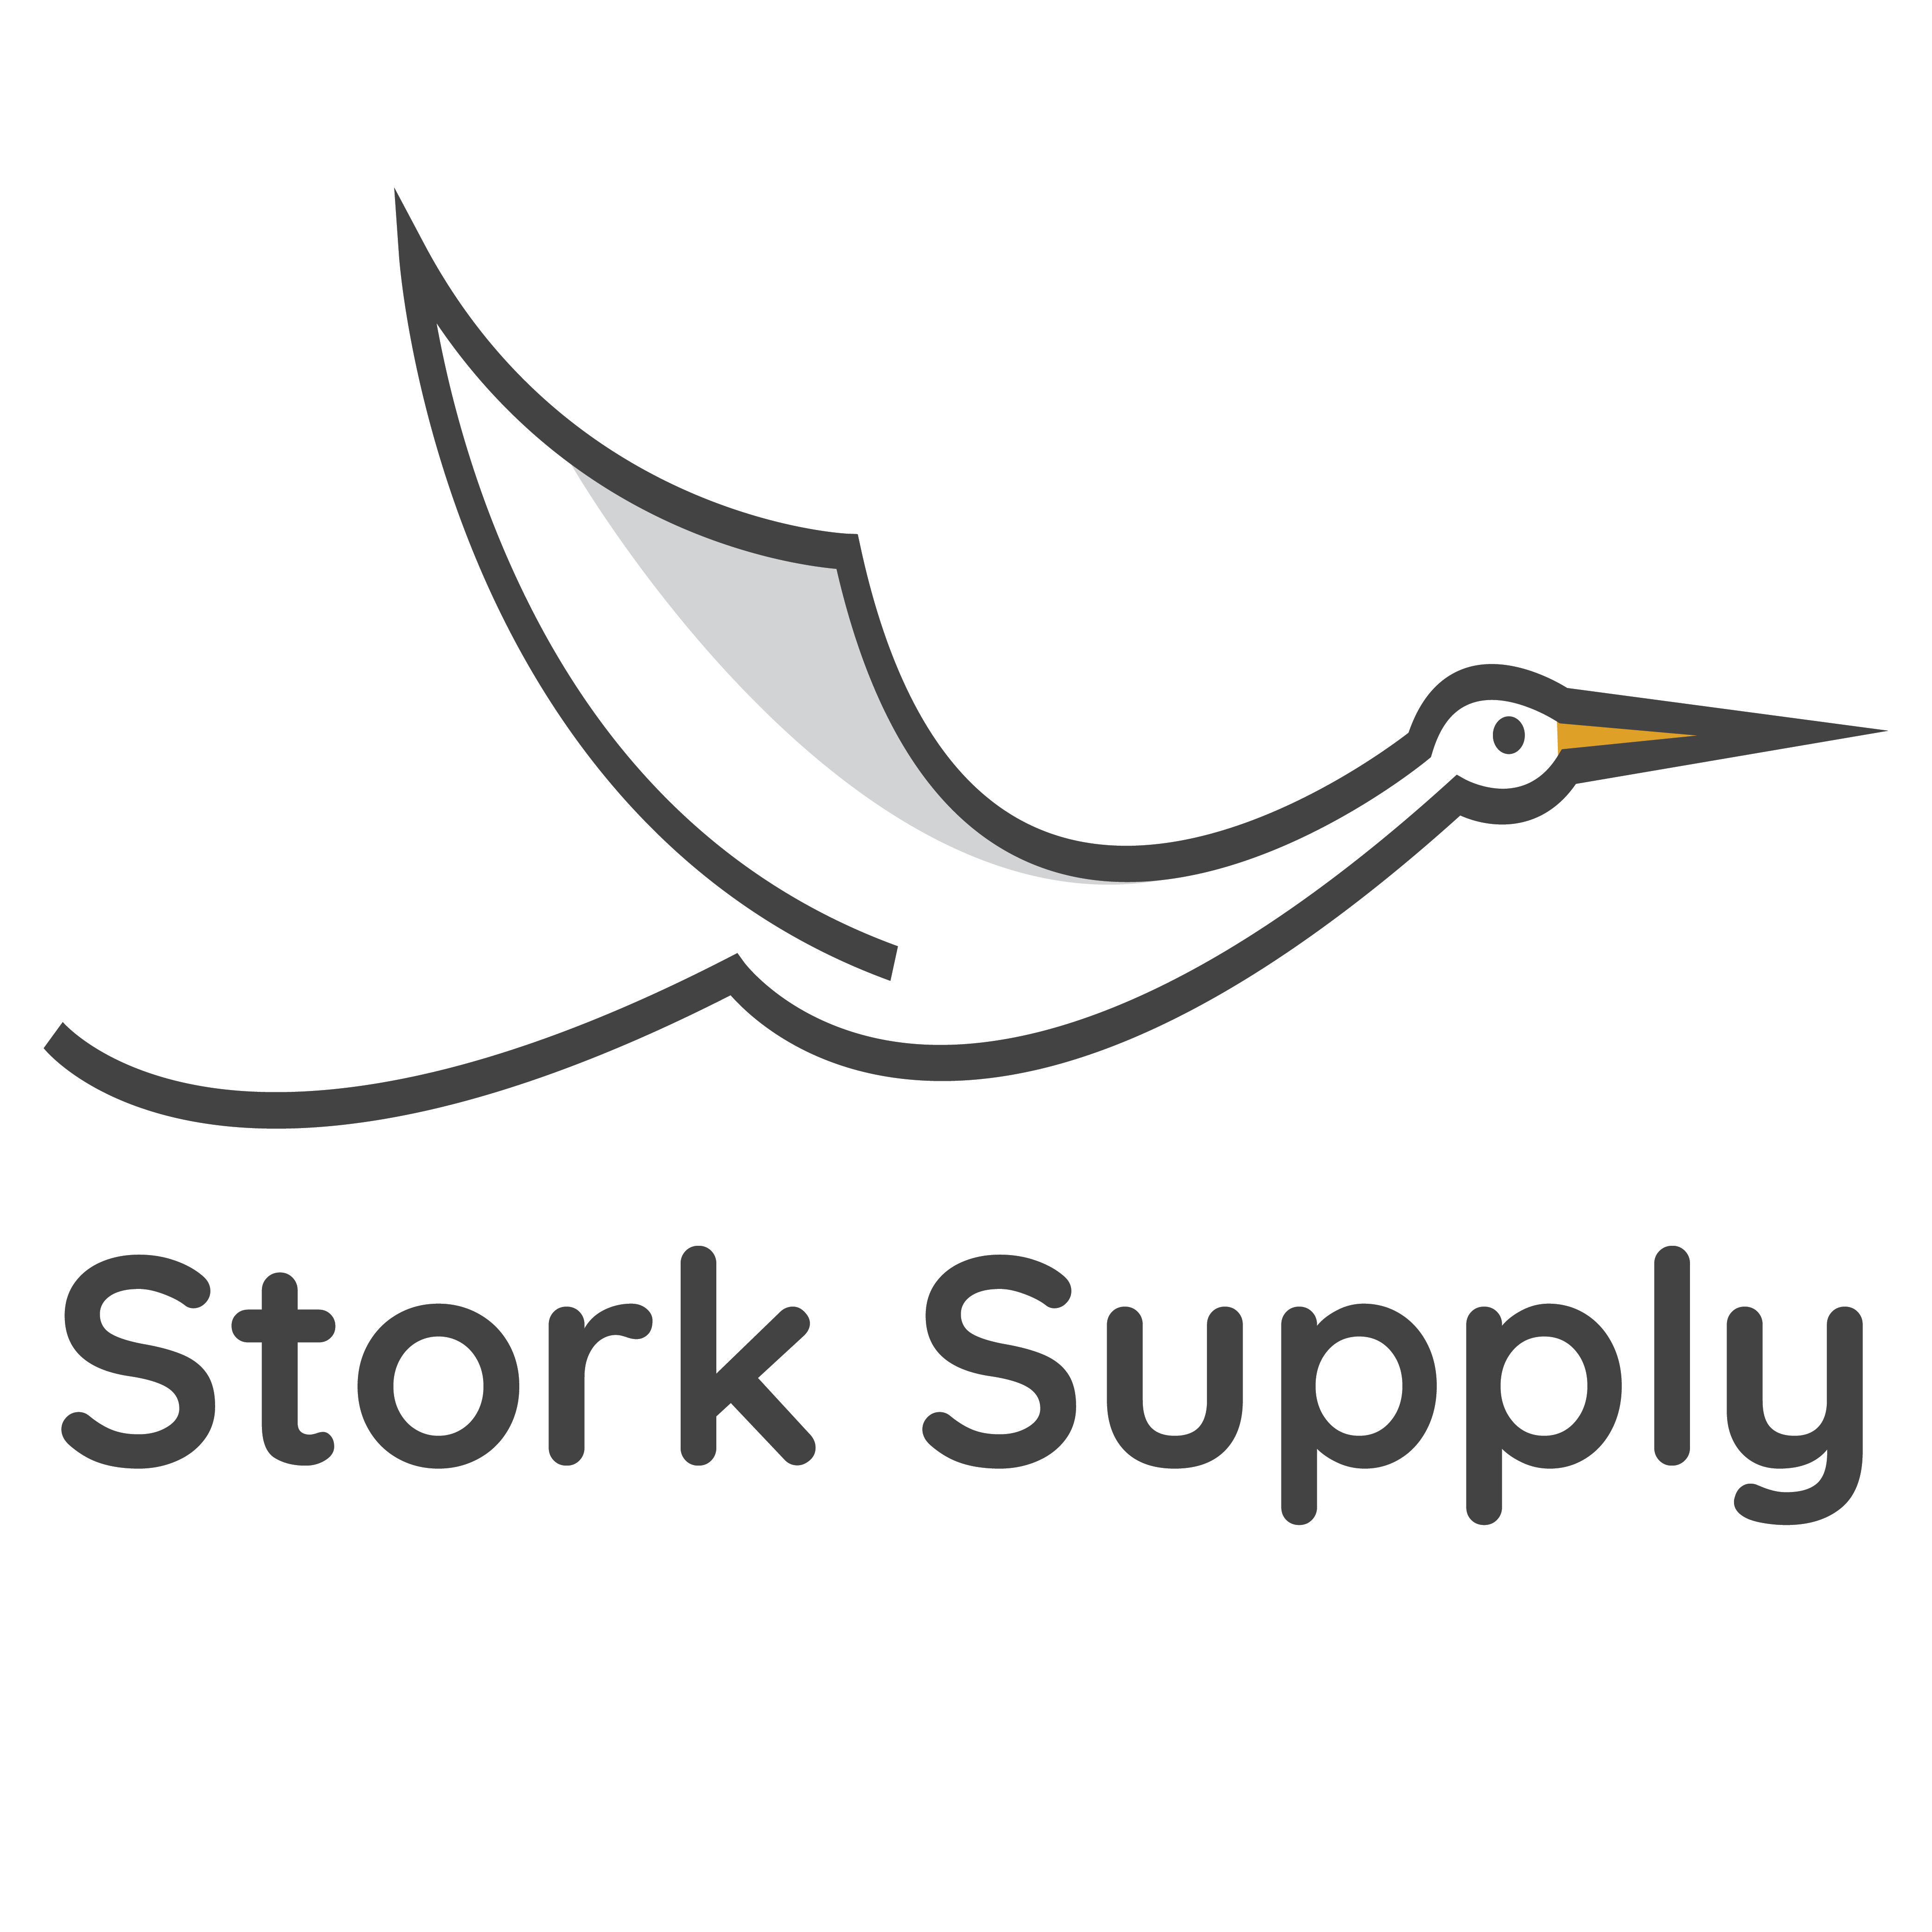 Stork Supply